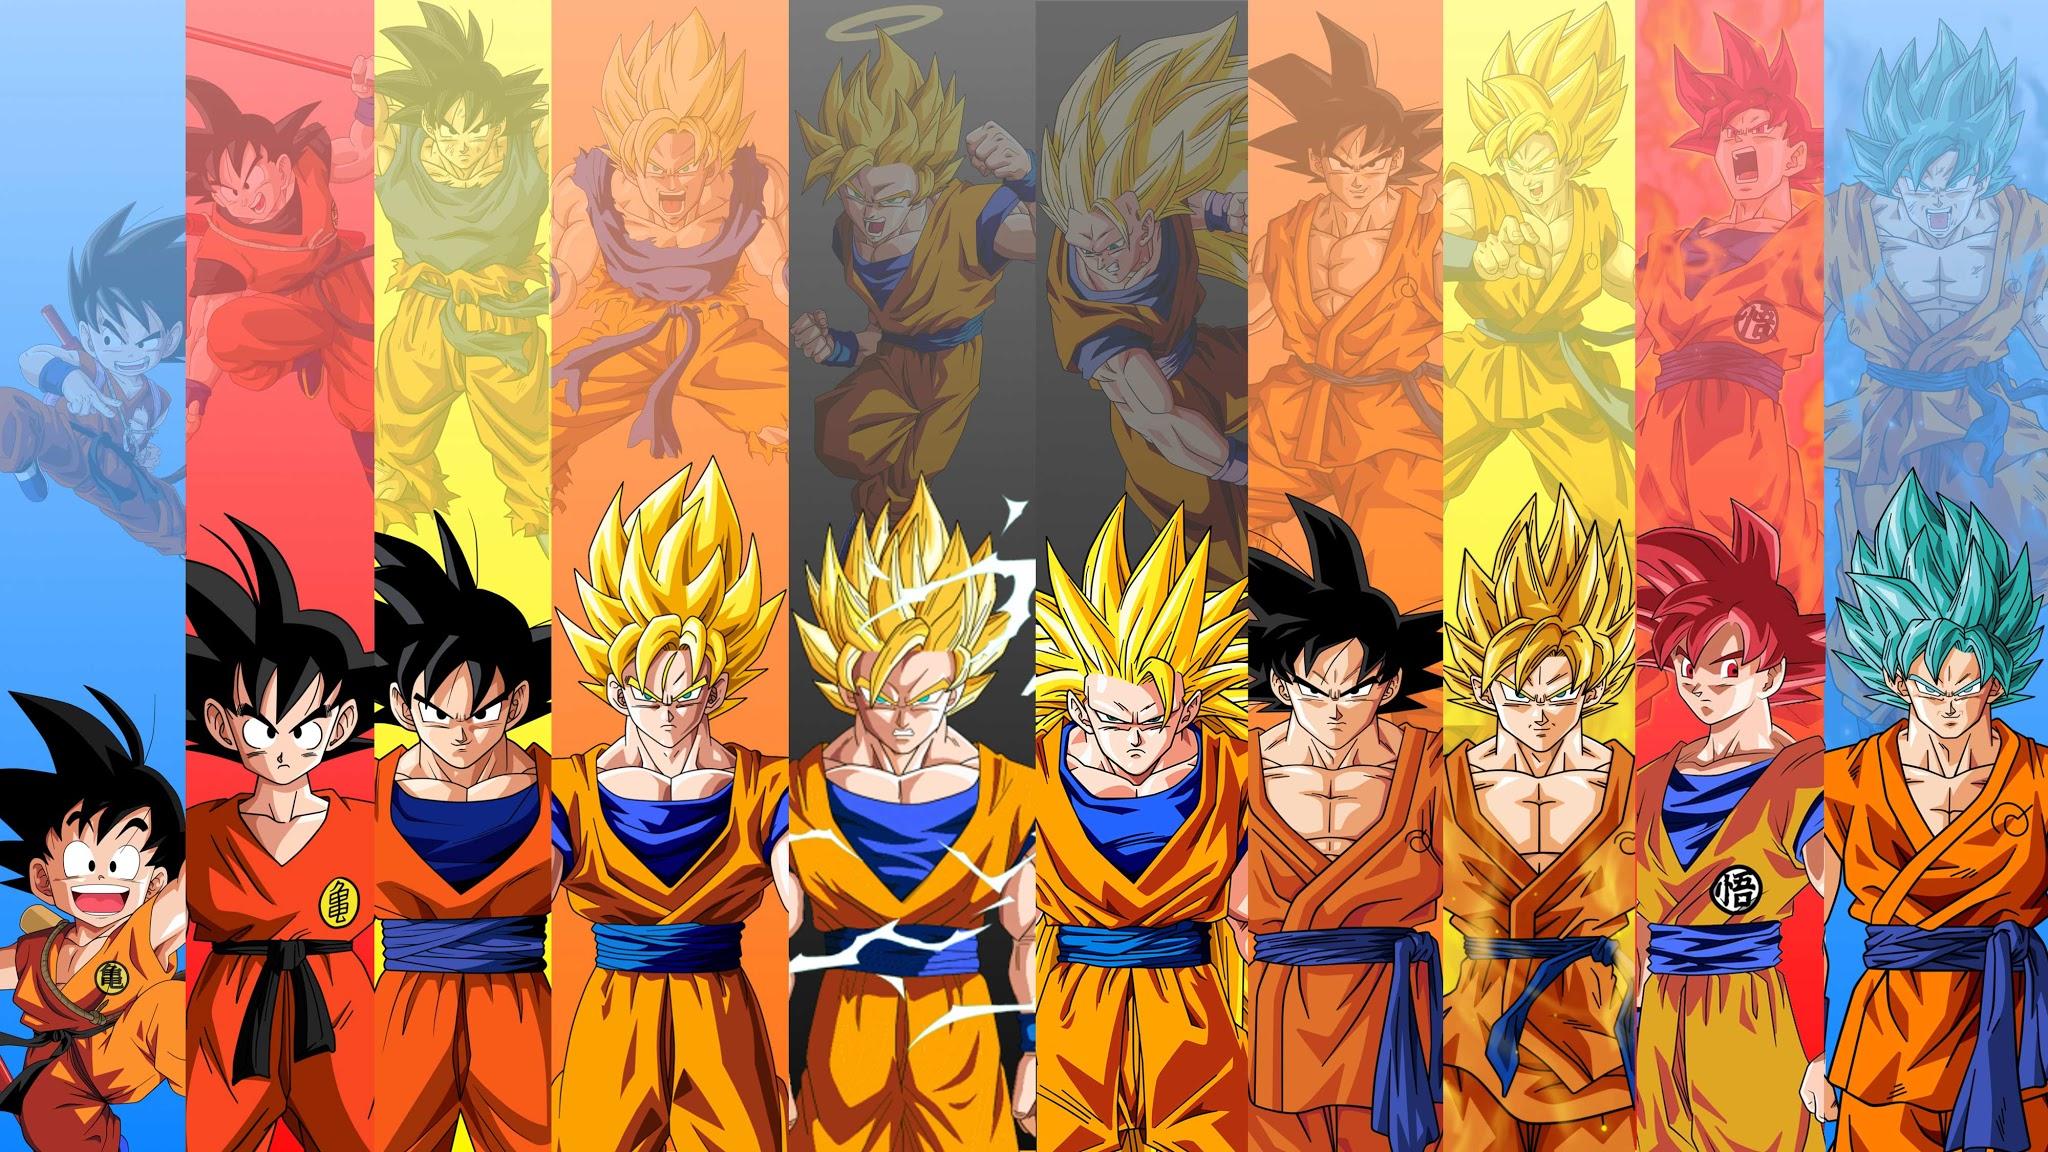 Papel De Parede Grátis Dragon Ball Z